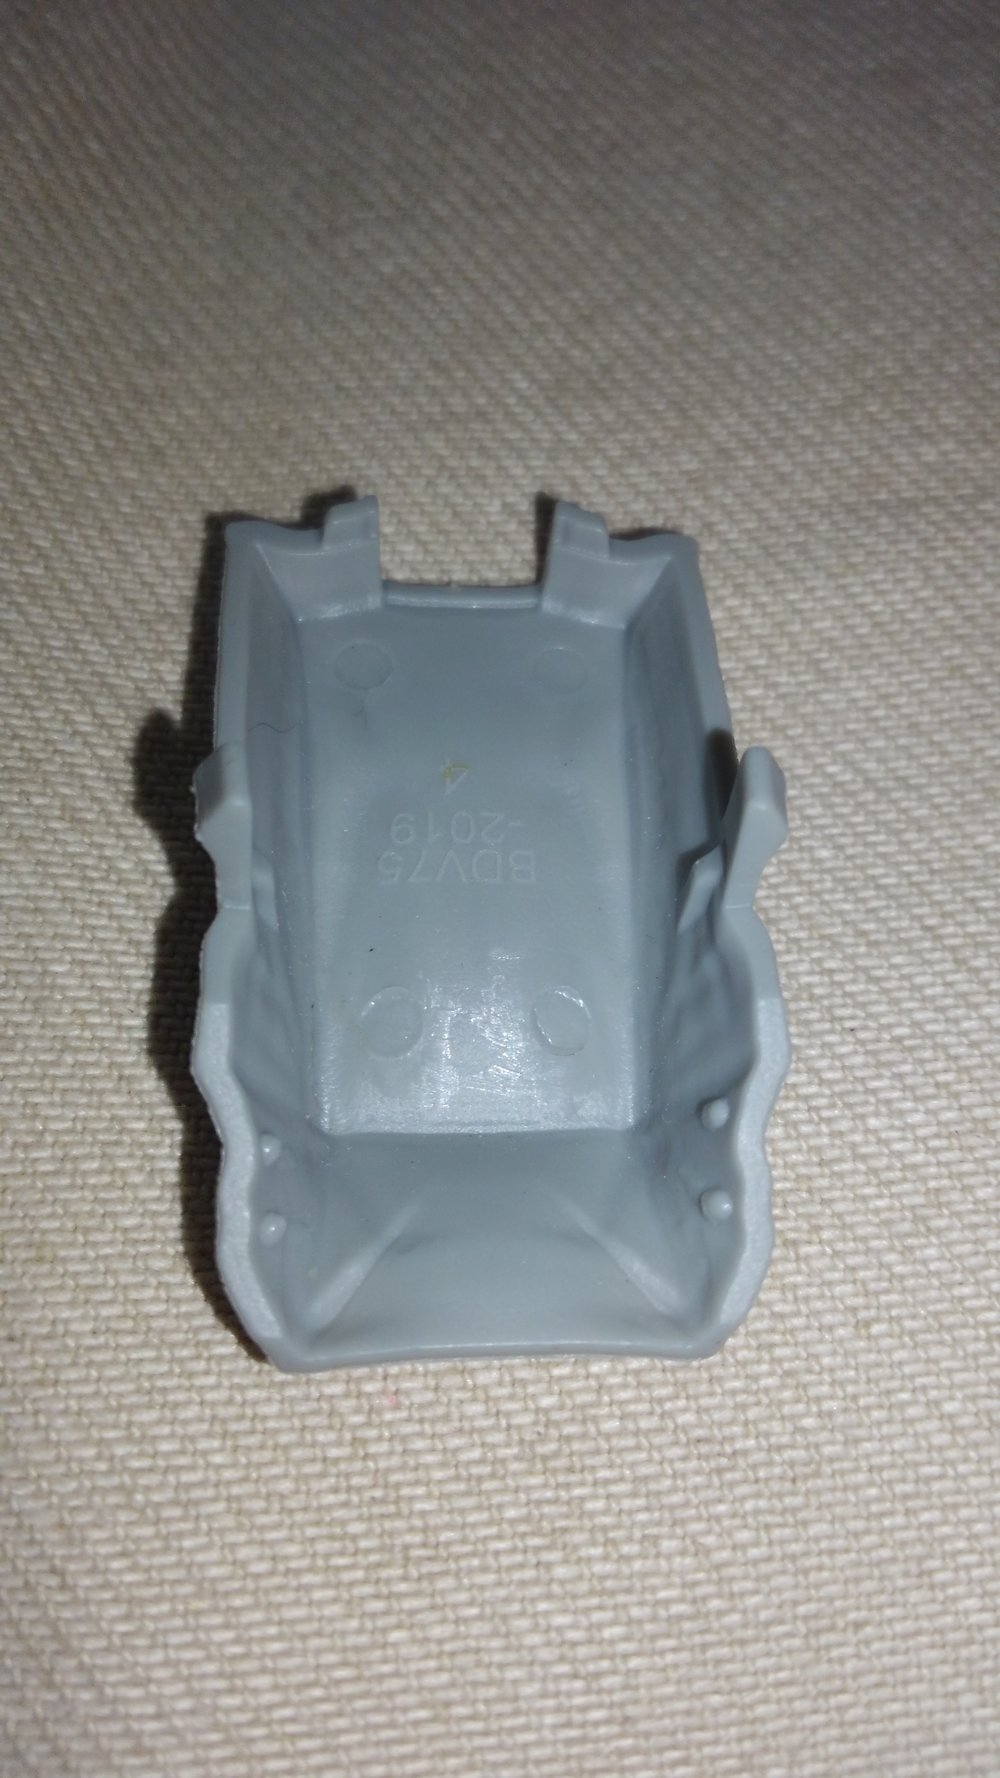 KIMG0232.JPG